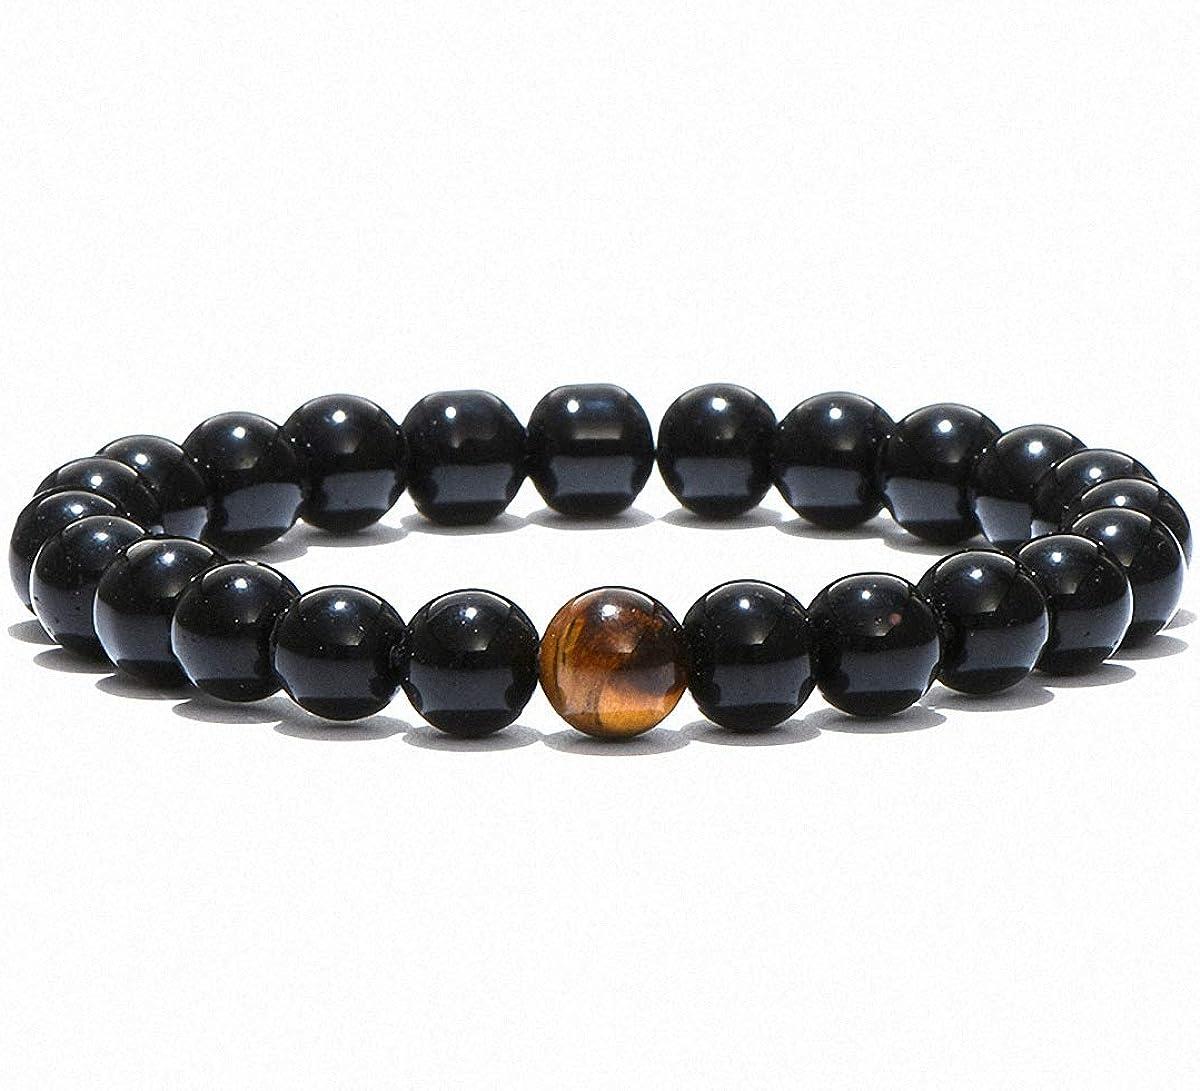 Yoga Meditation gift Men Tiger eyeLava stone Bracelet Hamsa Hand charm jewelry Tiger eye natural gemstone Crystal healing bracelet